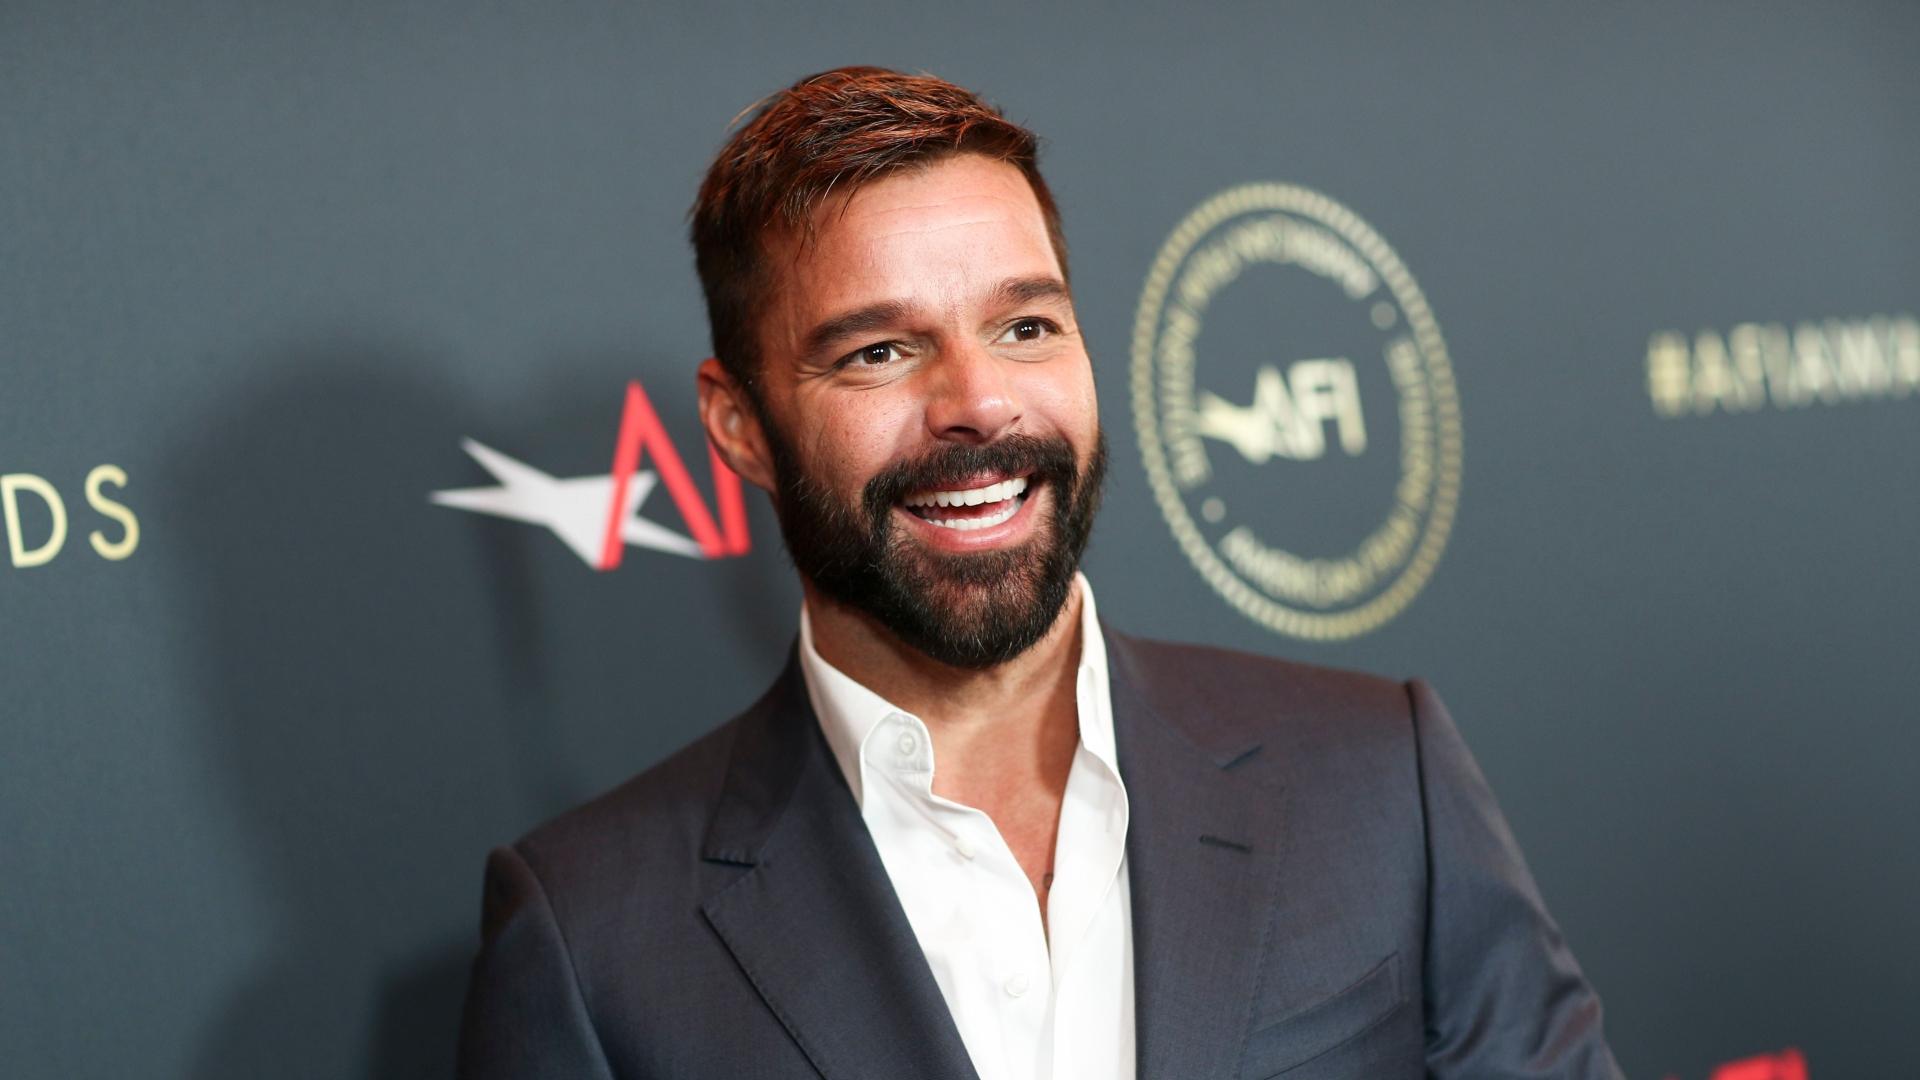 Festival de Viña negociaría con Ricky Martin para traerlo el 2020